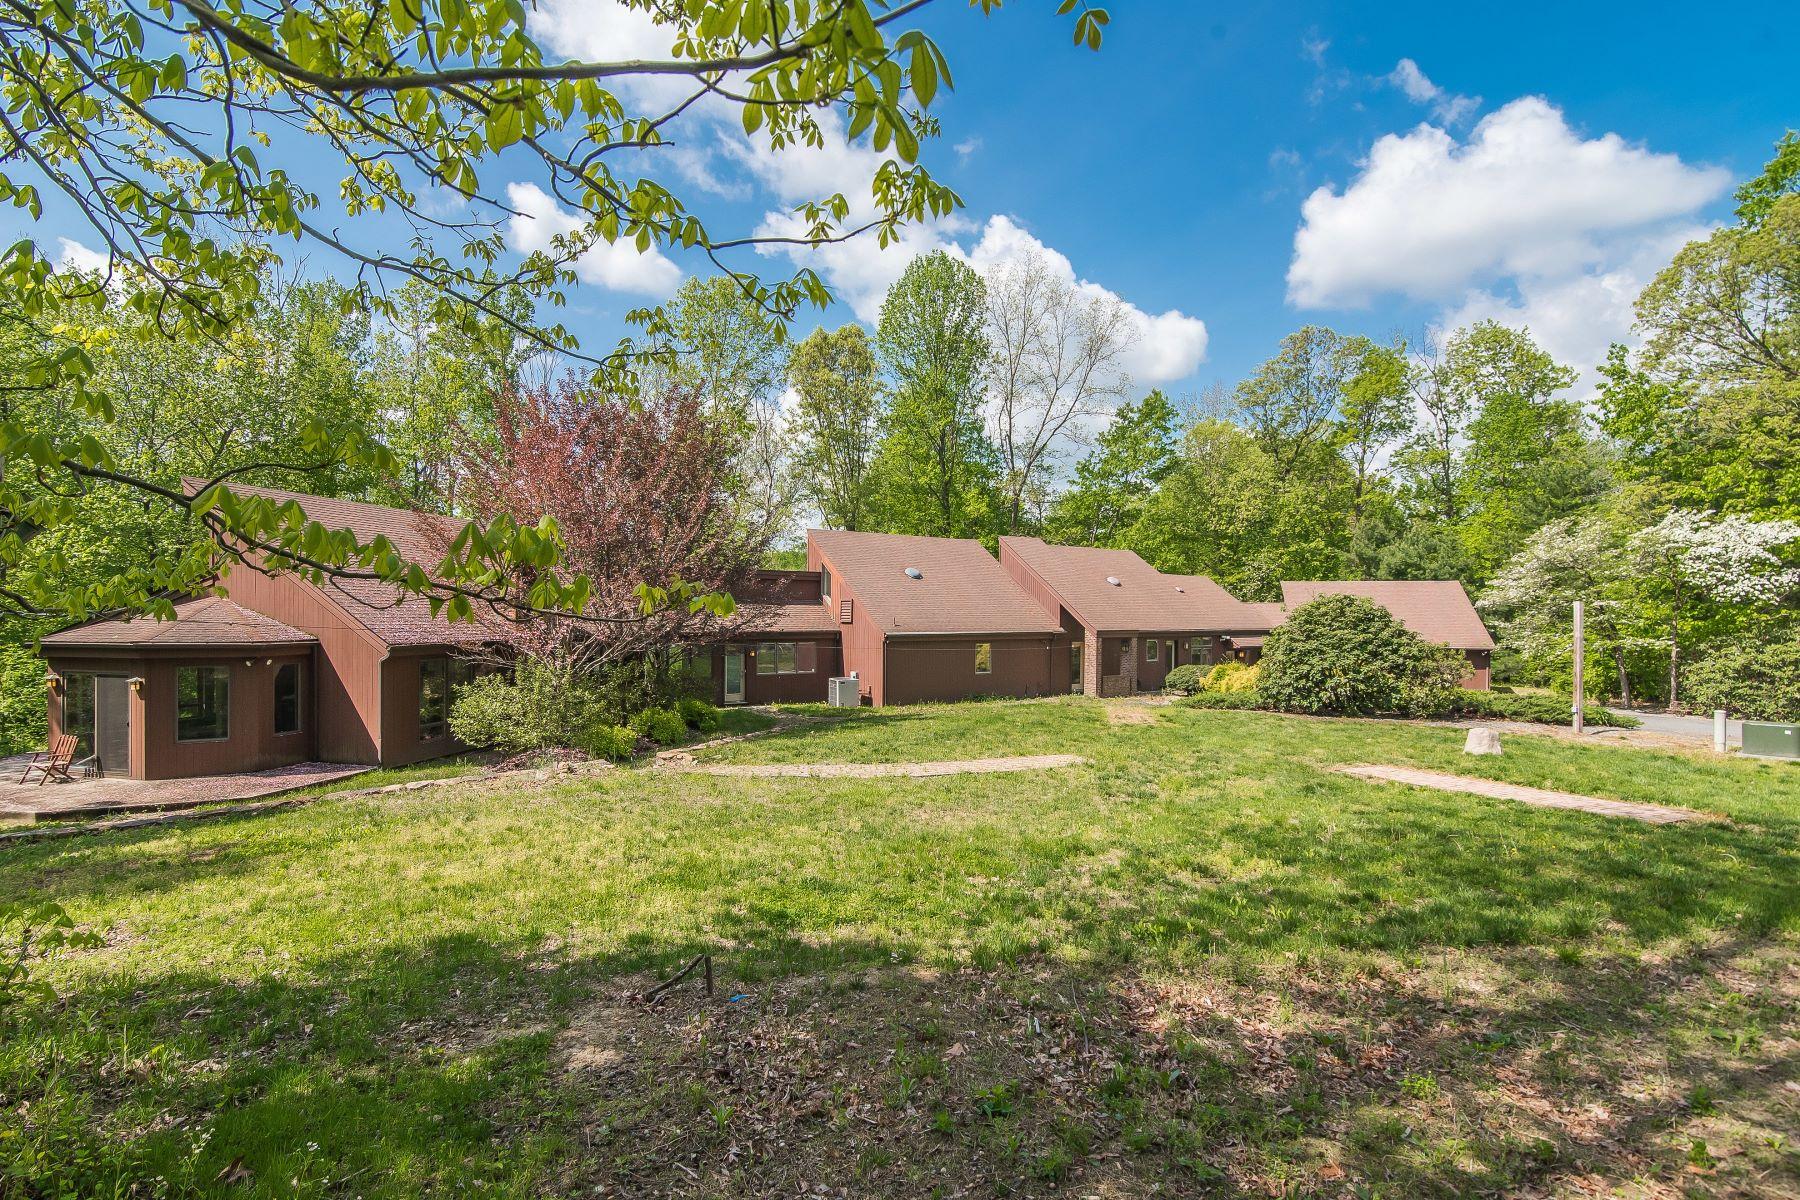 独户住宅 为 销售 在 Pleasant Hill 462 Kirk Road, Elkton, 马里兰州 21921 美国